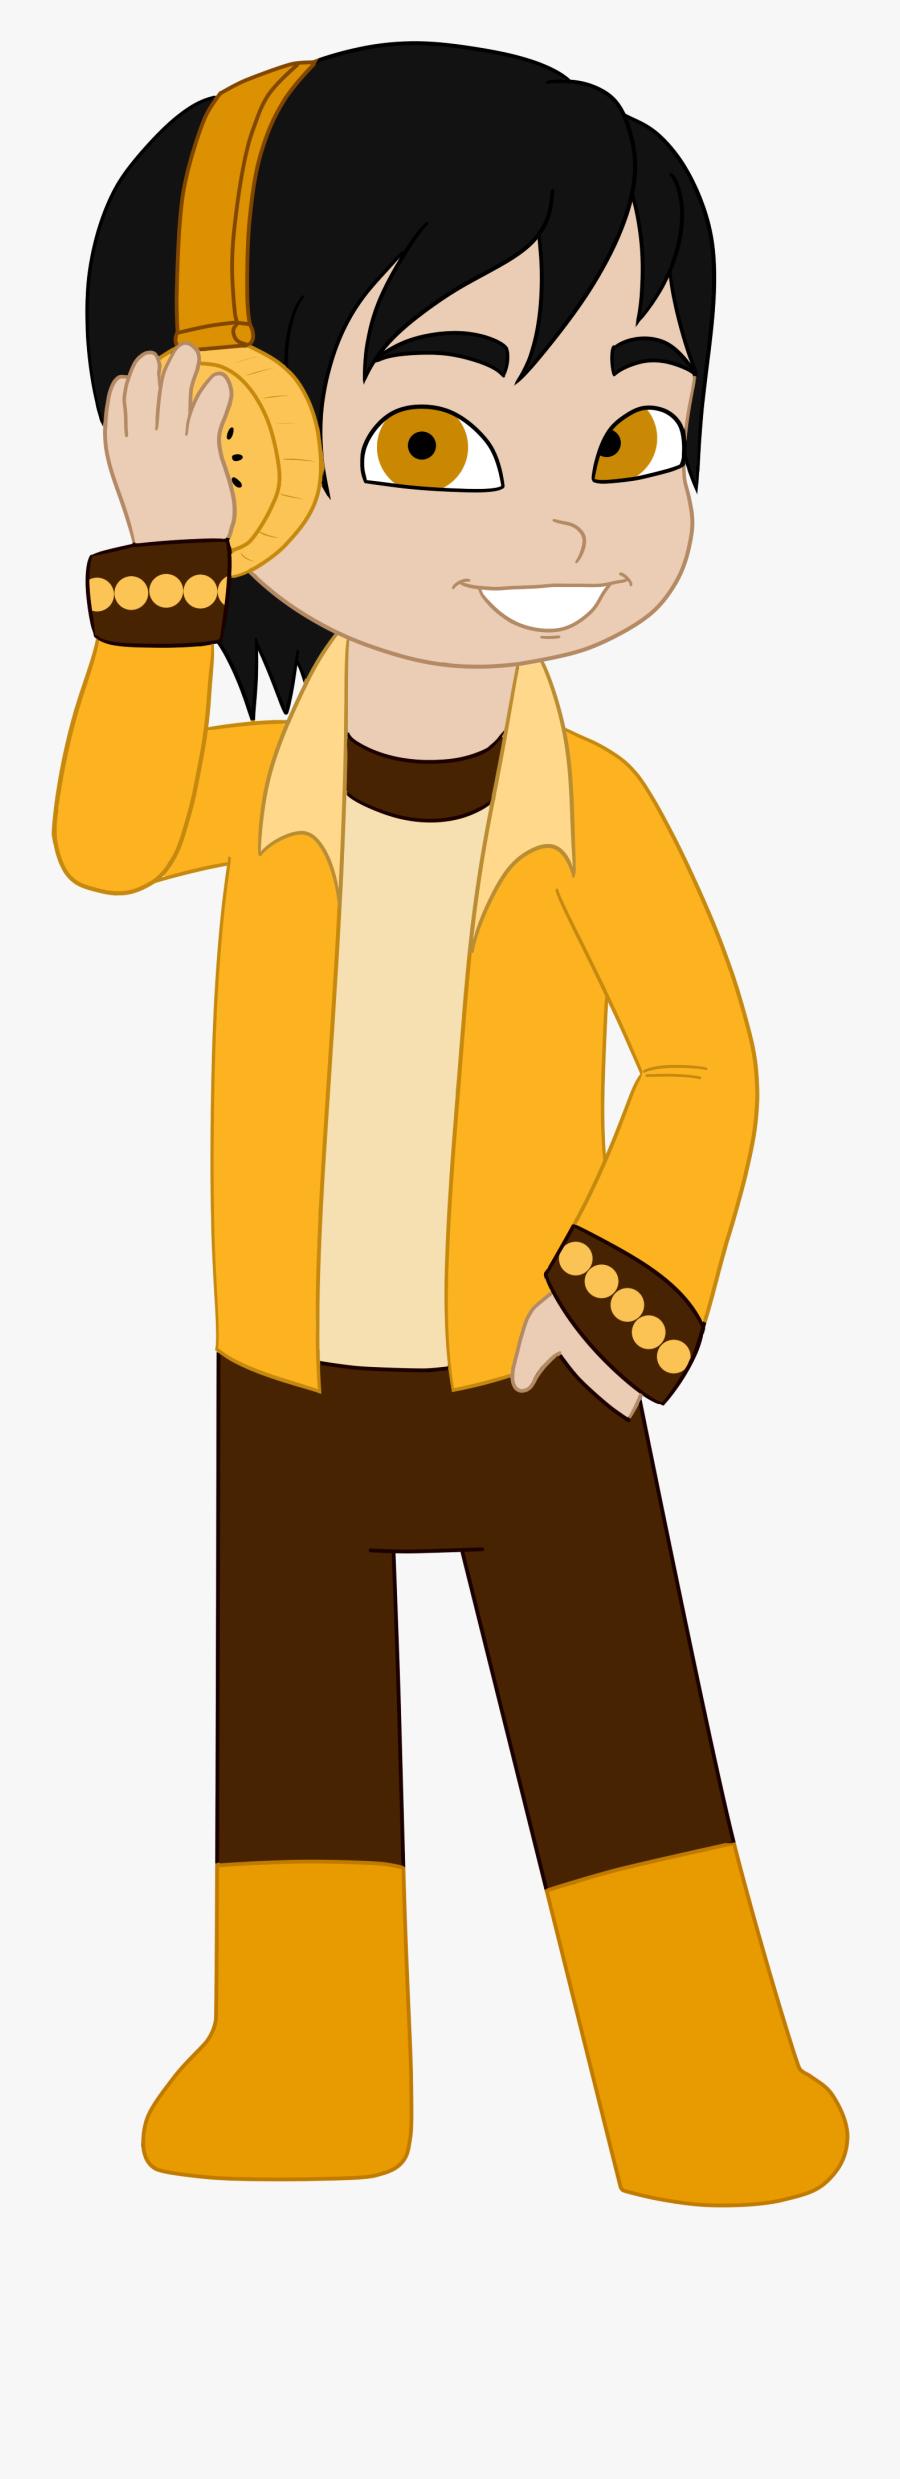 Banamothy Cremeswirl Is A Racer From Sugar Rush Reloaded - Wreck It Ralph Sugar Rush Banana, Transparent Clipart